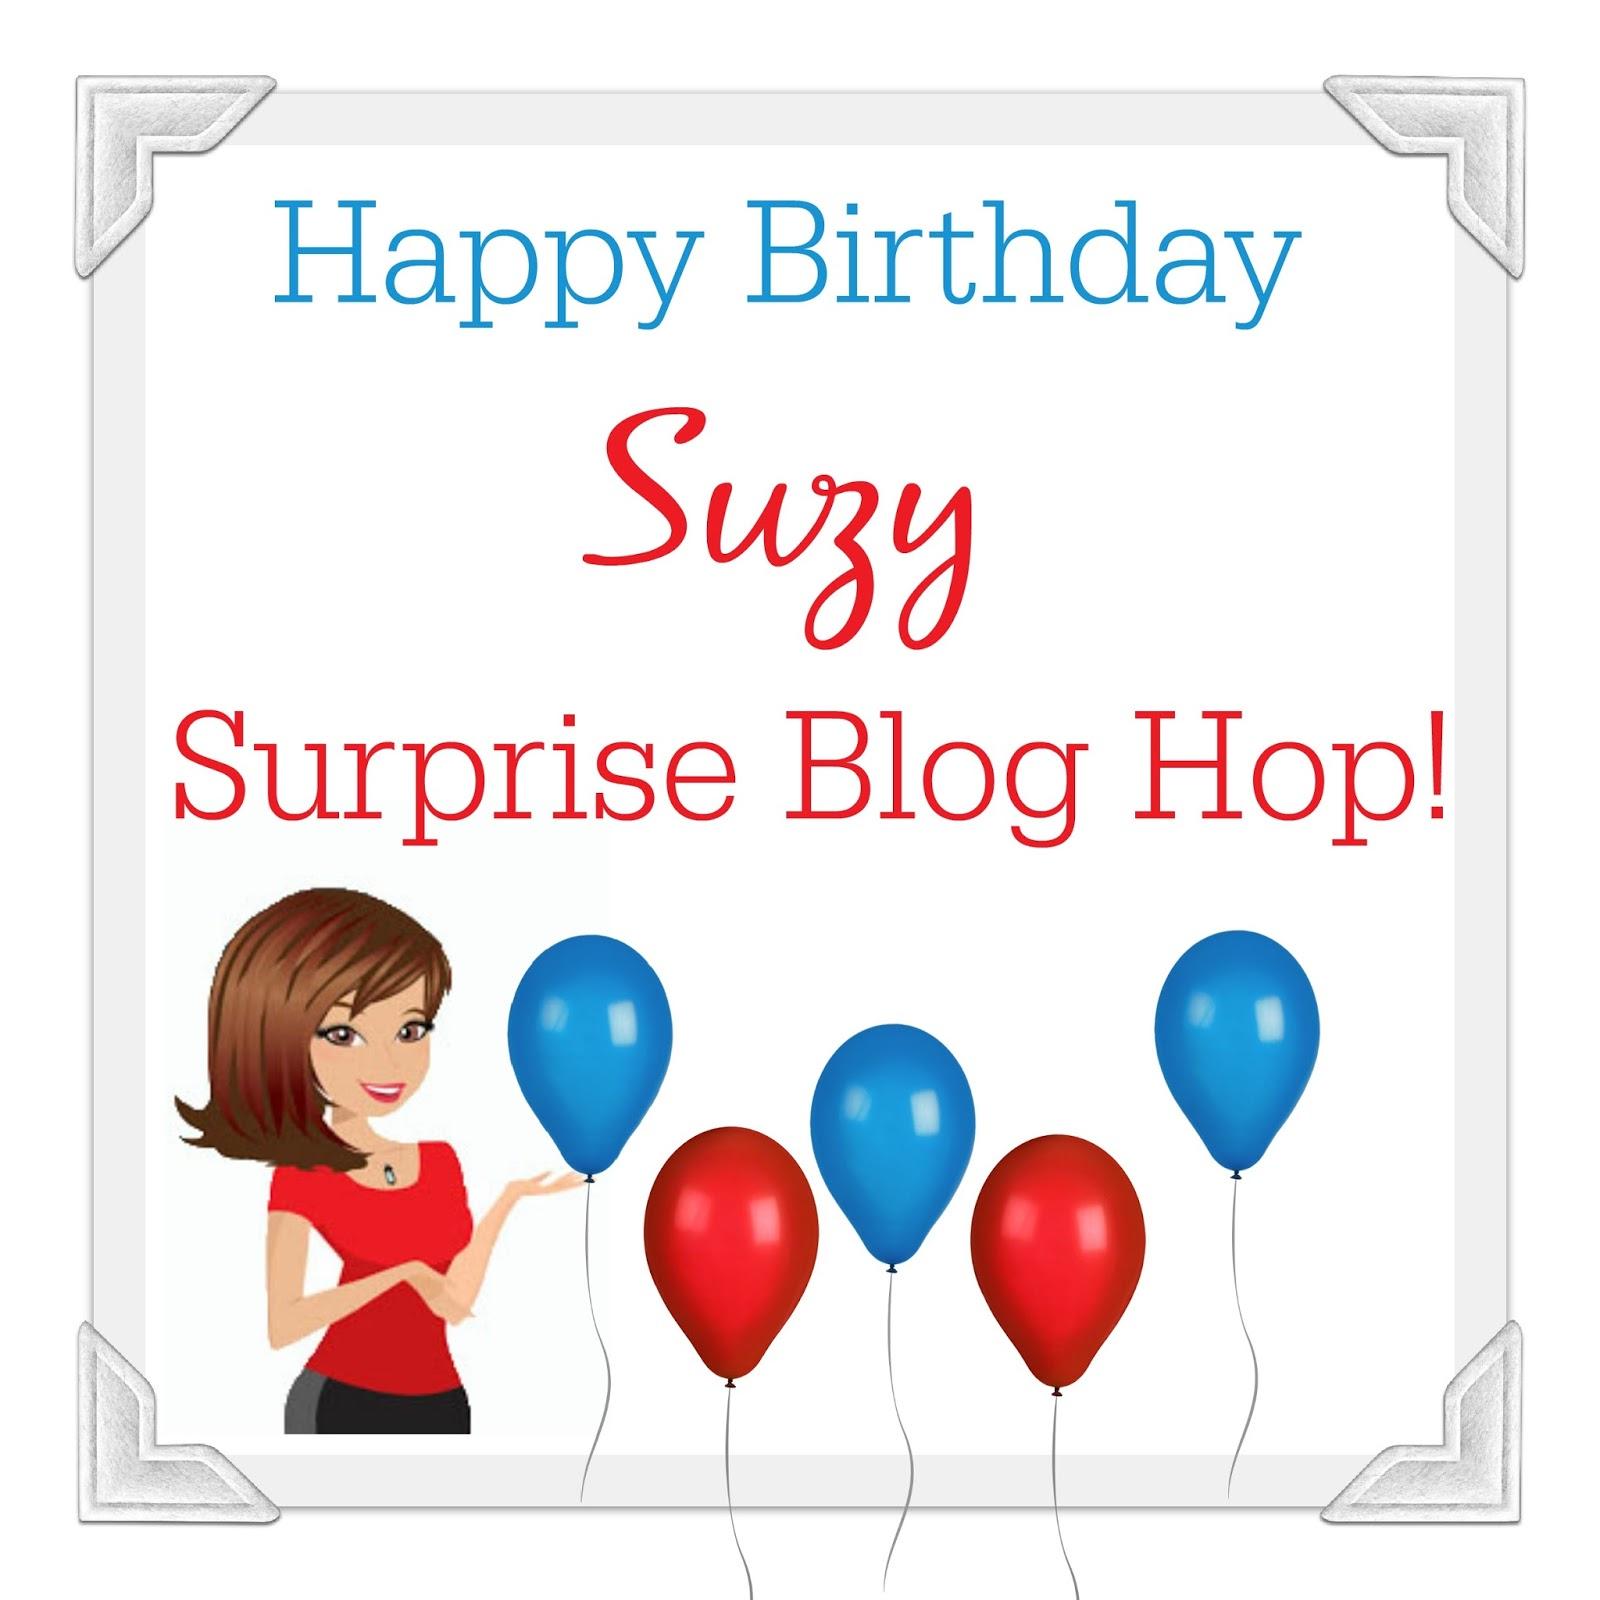 Caffeinated Papercuts: Happy Birthday Suzy